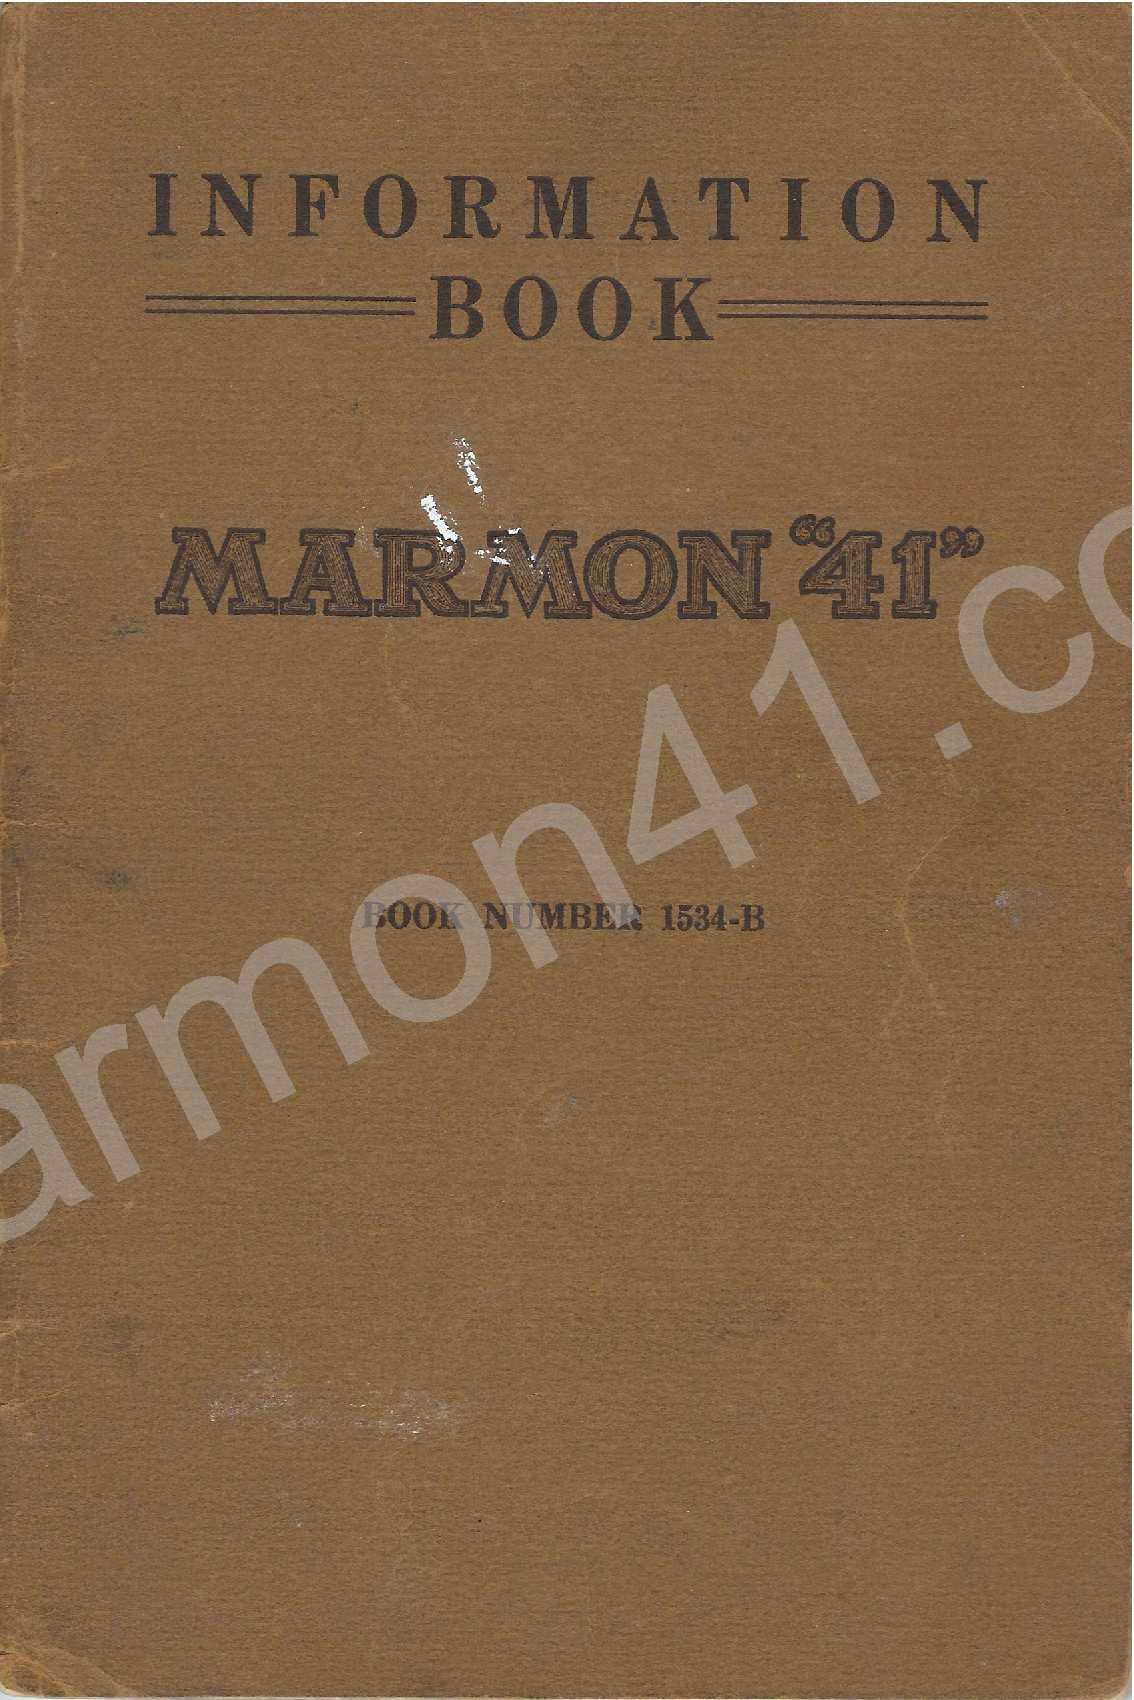 1915-07-01_Marmon41_Info_Book_1534-B_1